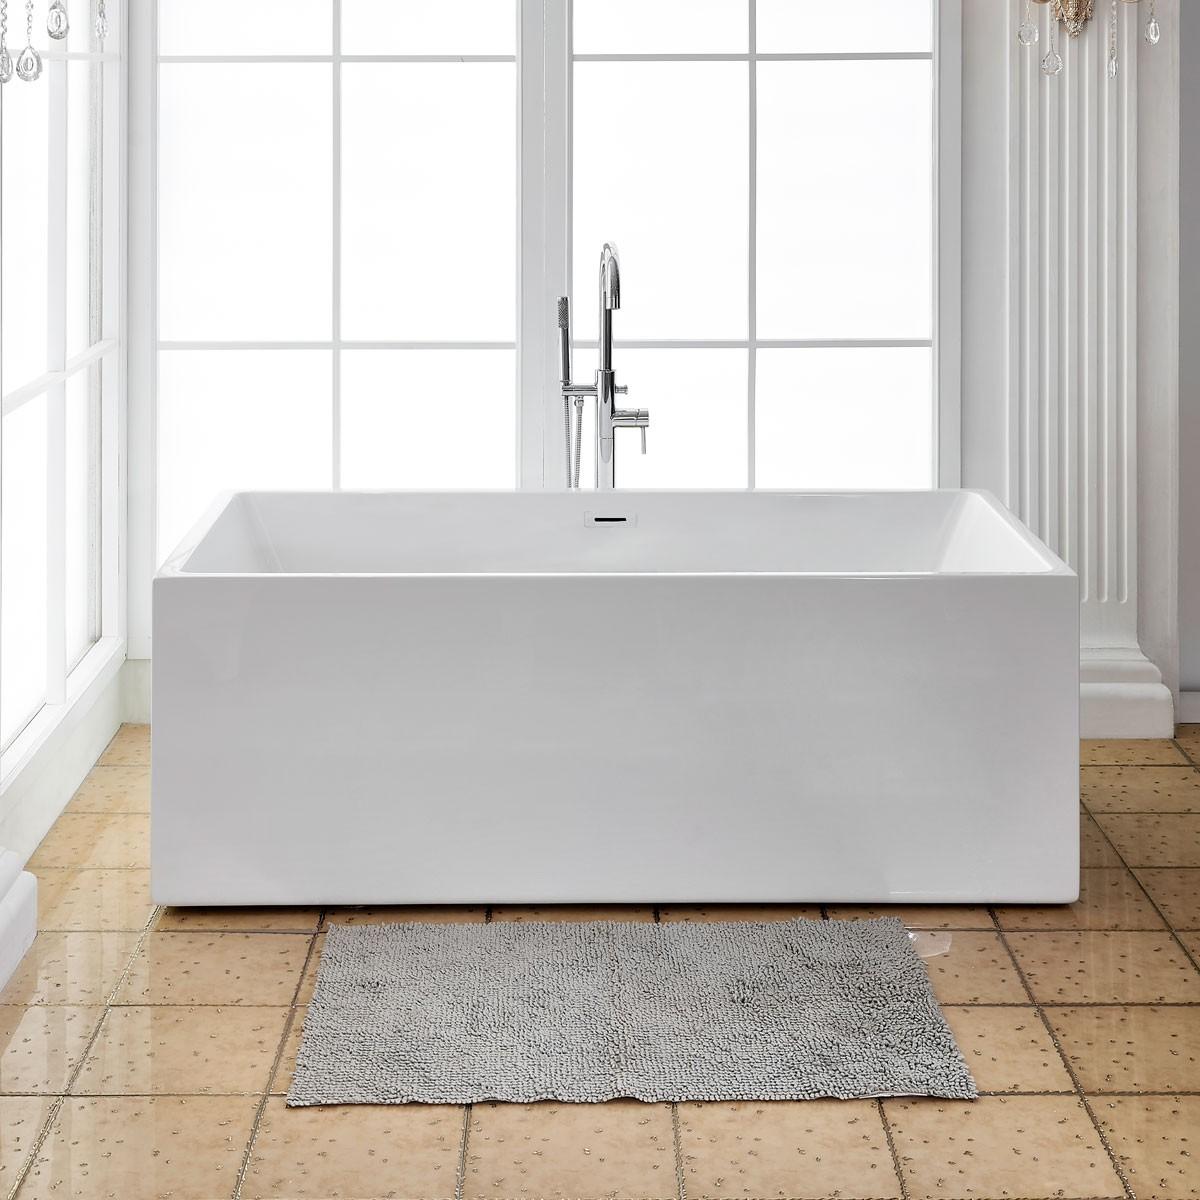 60 In Freestanding Bathtub - Acrylic Pure White (DK-PW-1564)